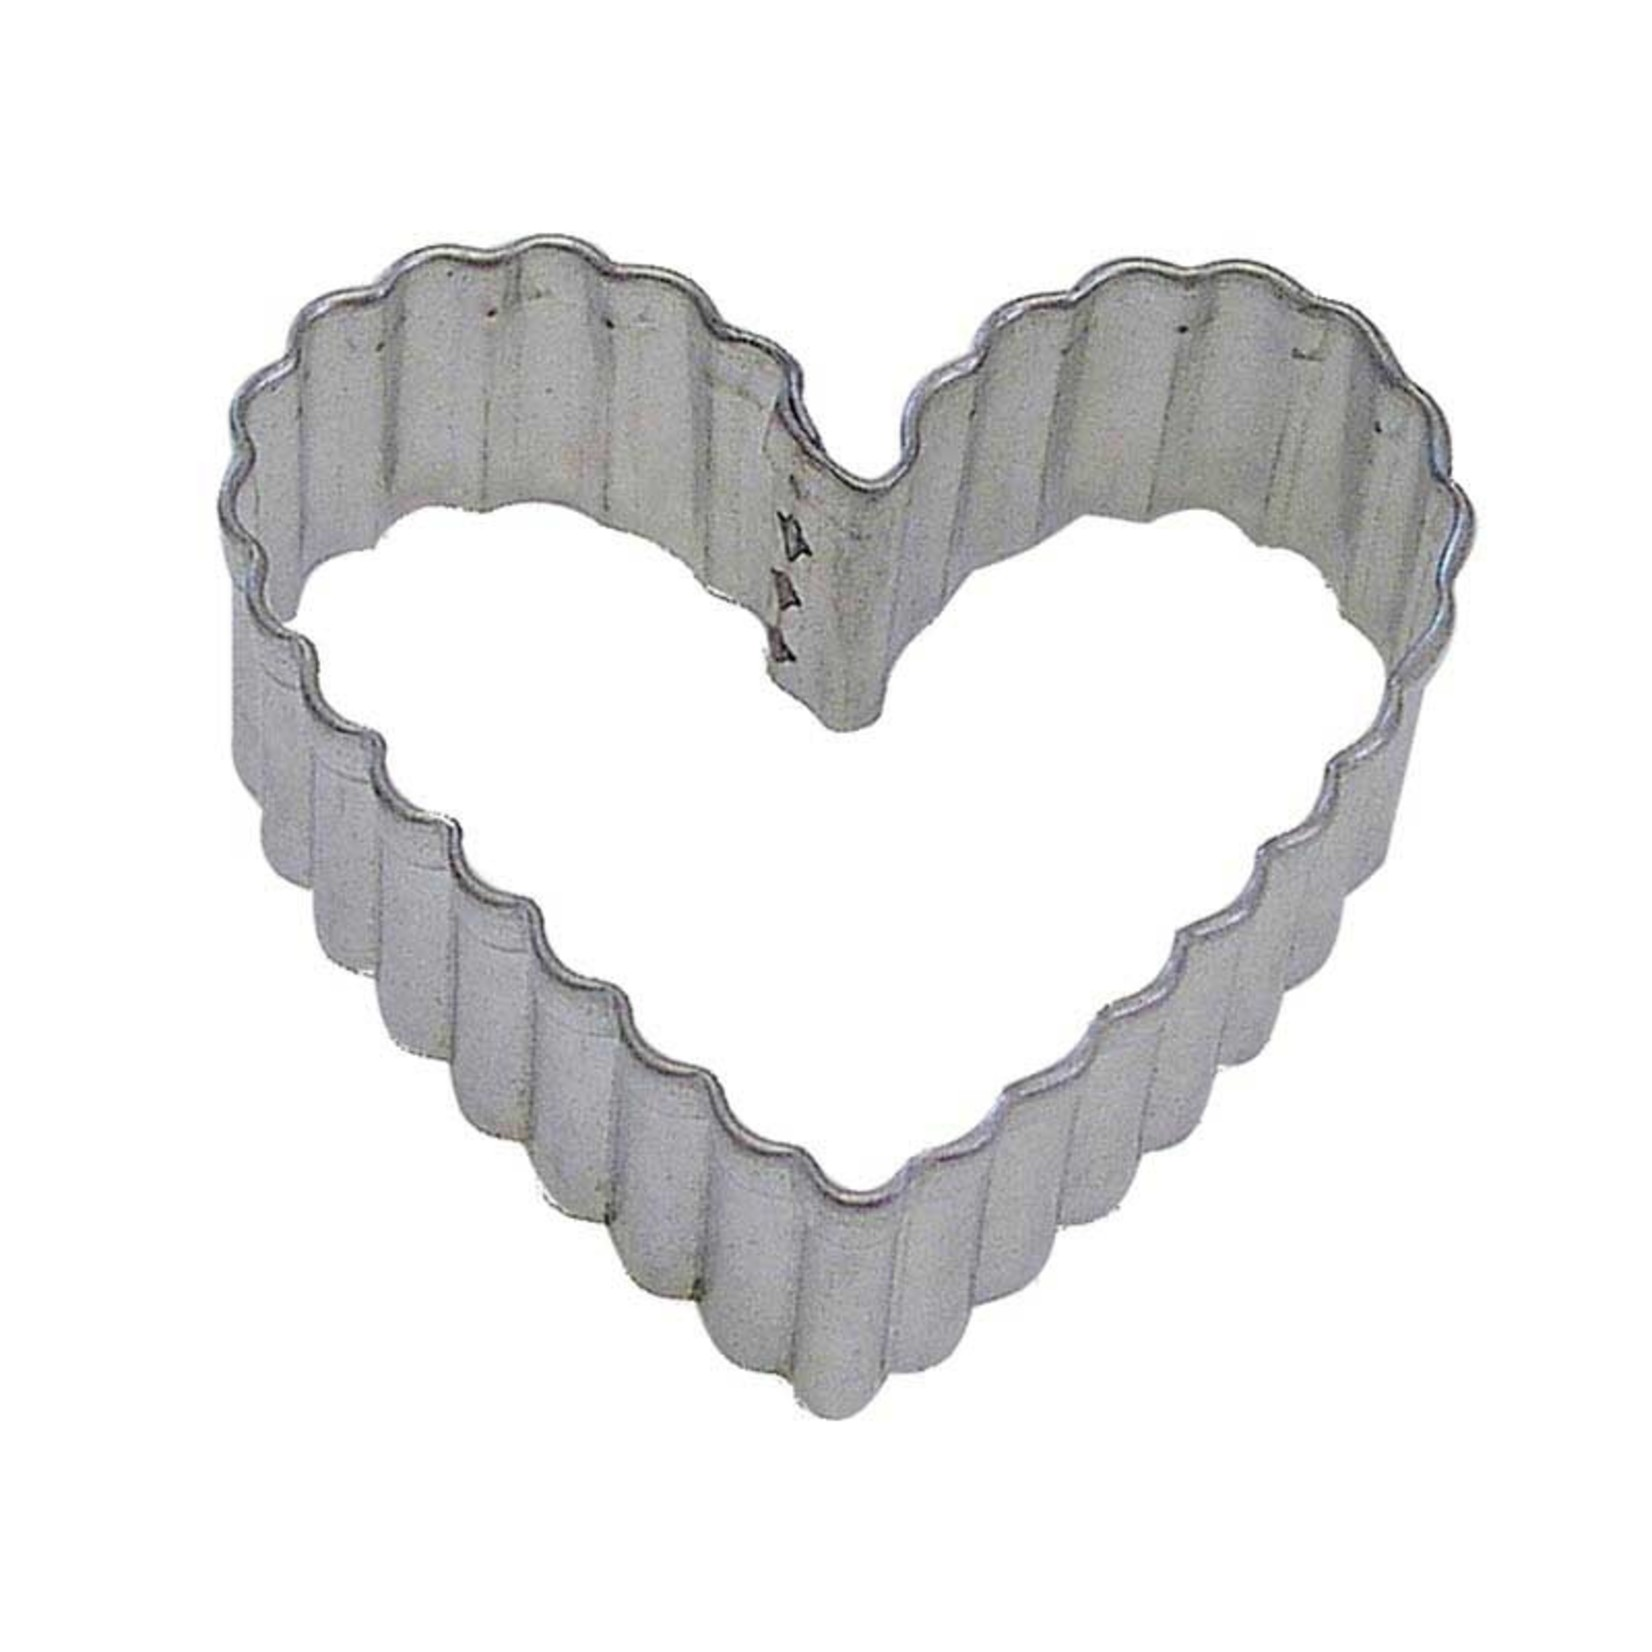 "3.5"" Fluted Heart Cookie Cutter"